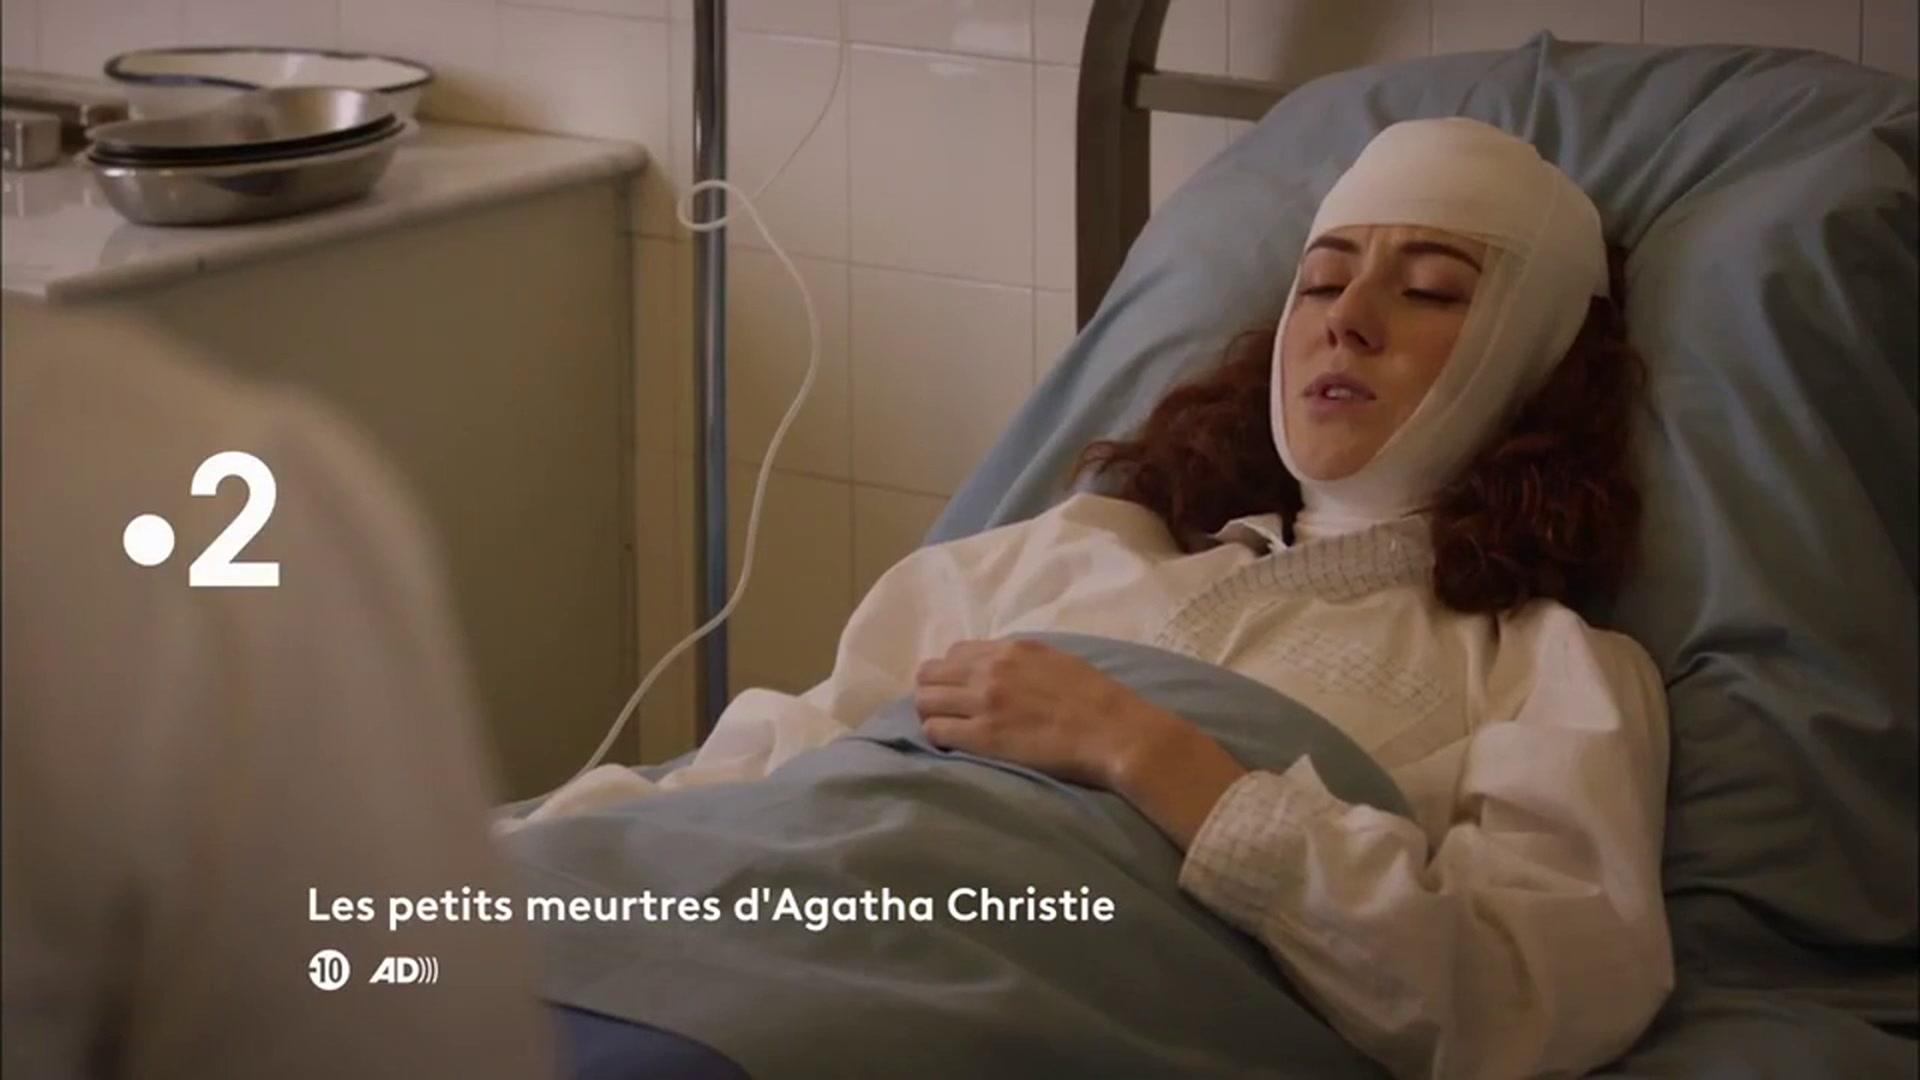 Les petits meurtres d'Agatha Christie : Meurtres en solde